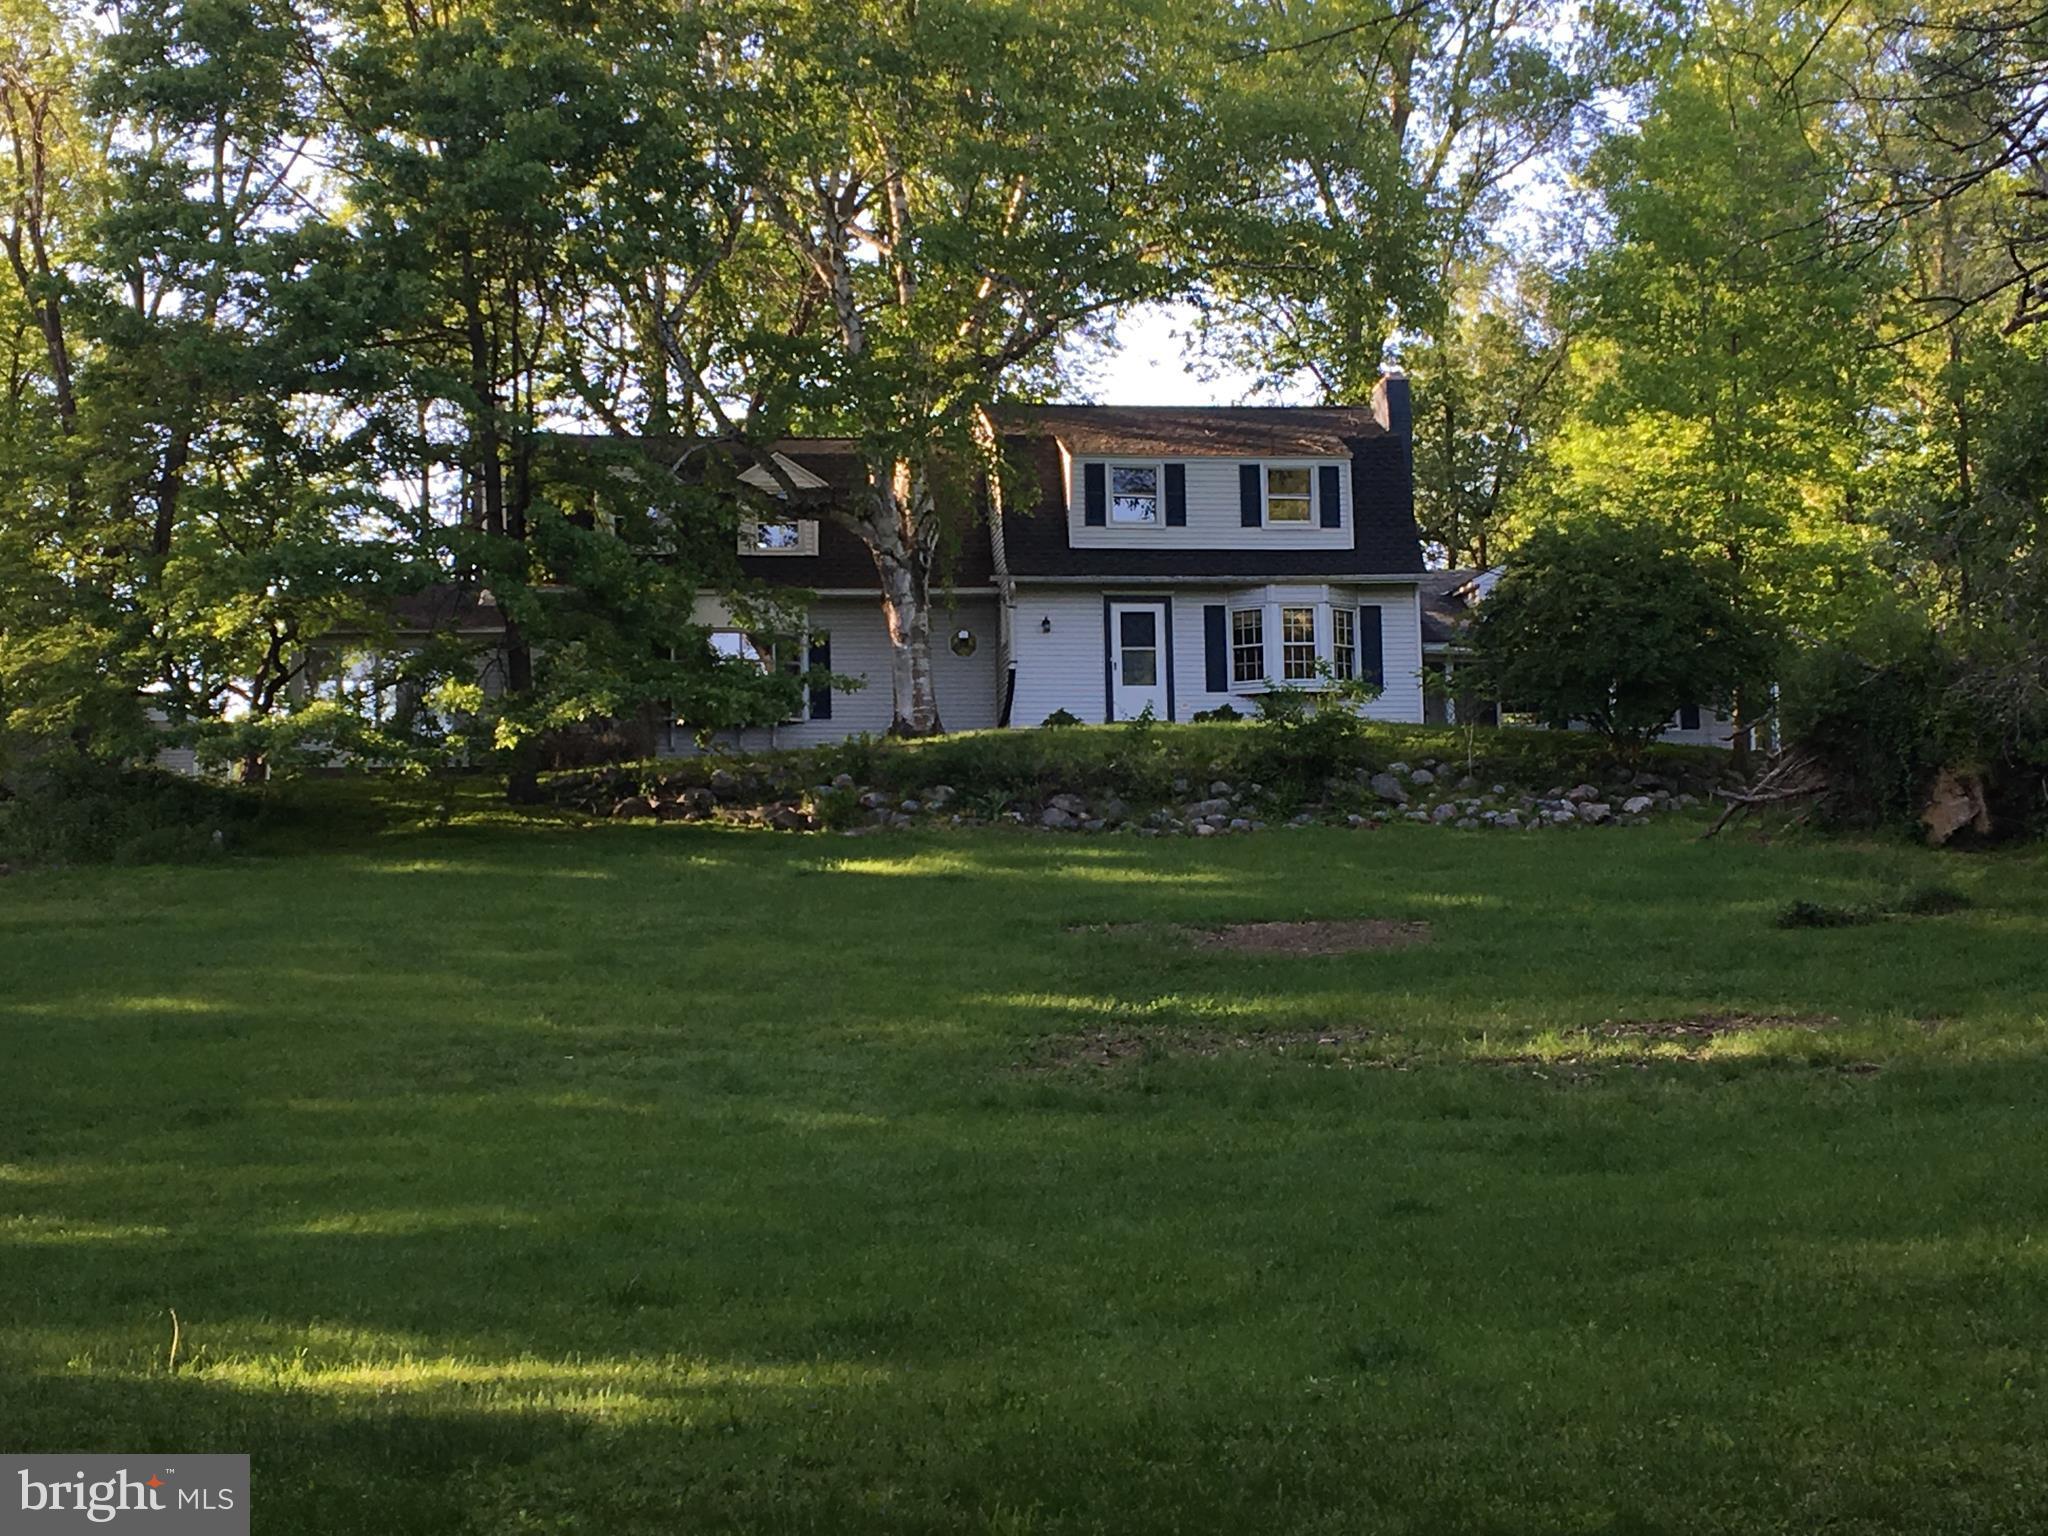 60 WASHINGTON BOULEVARD, BANGOR, PA 18013